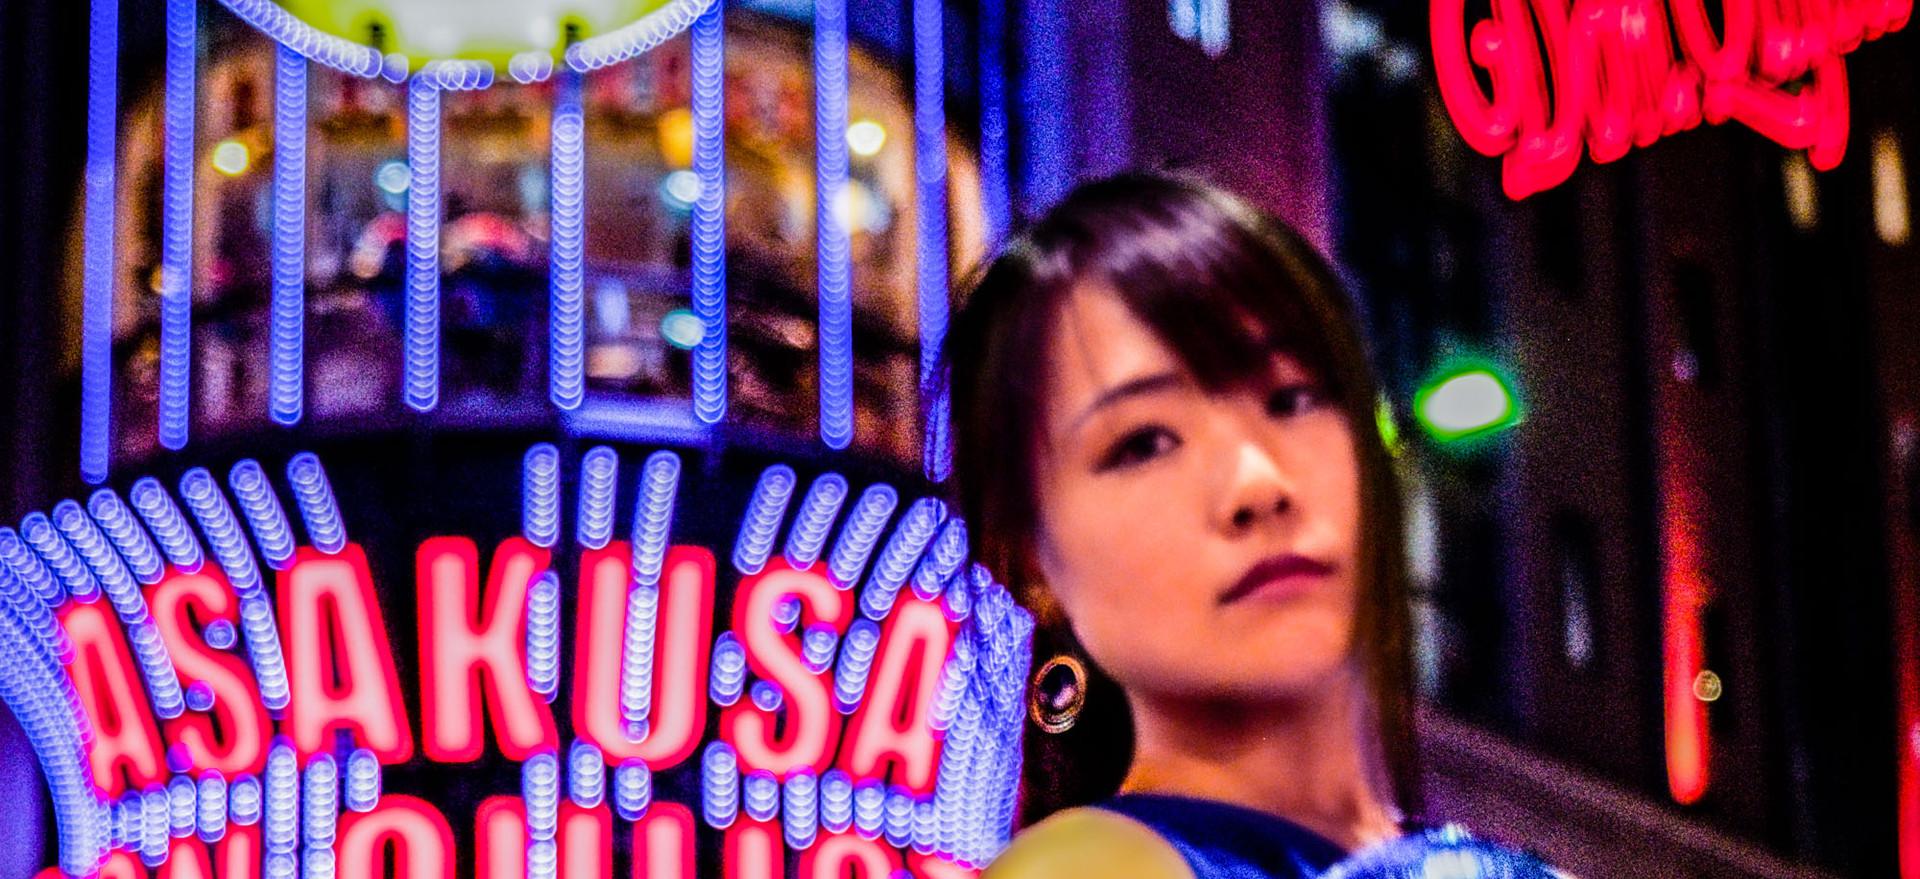 Asakusa Nanoka-026-Edit.jpg